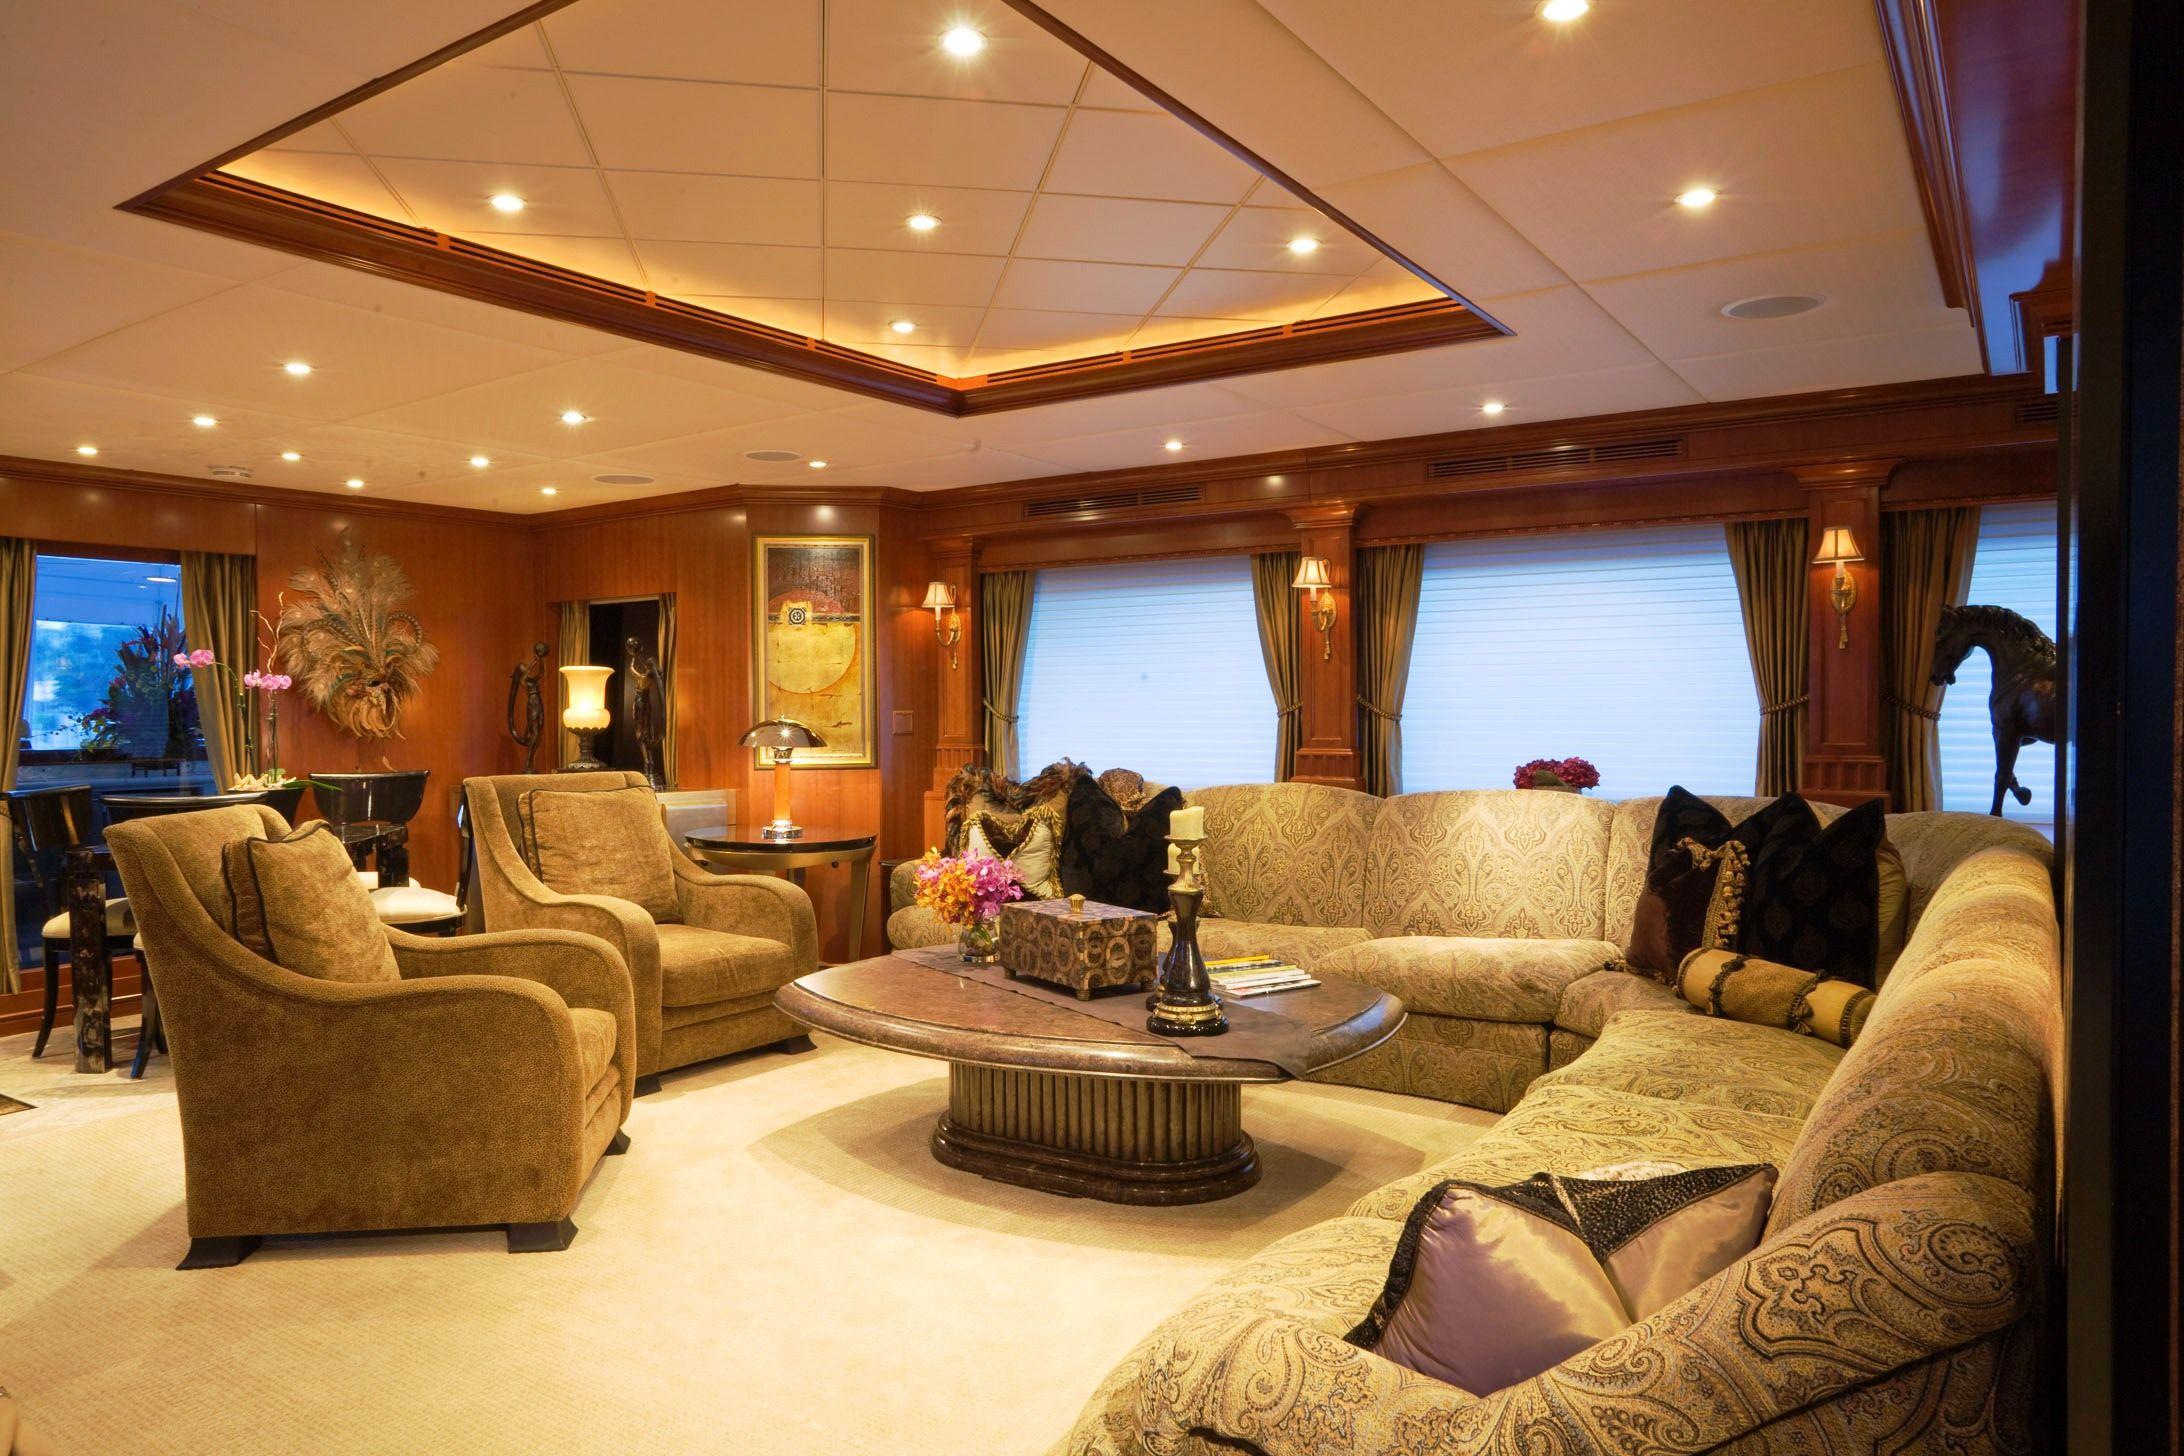 Yacht interior. Imagine relaxing and feeling the moment of the ocean waves.. heaven! #realestatedivabrenda #brendadouglas